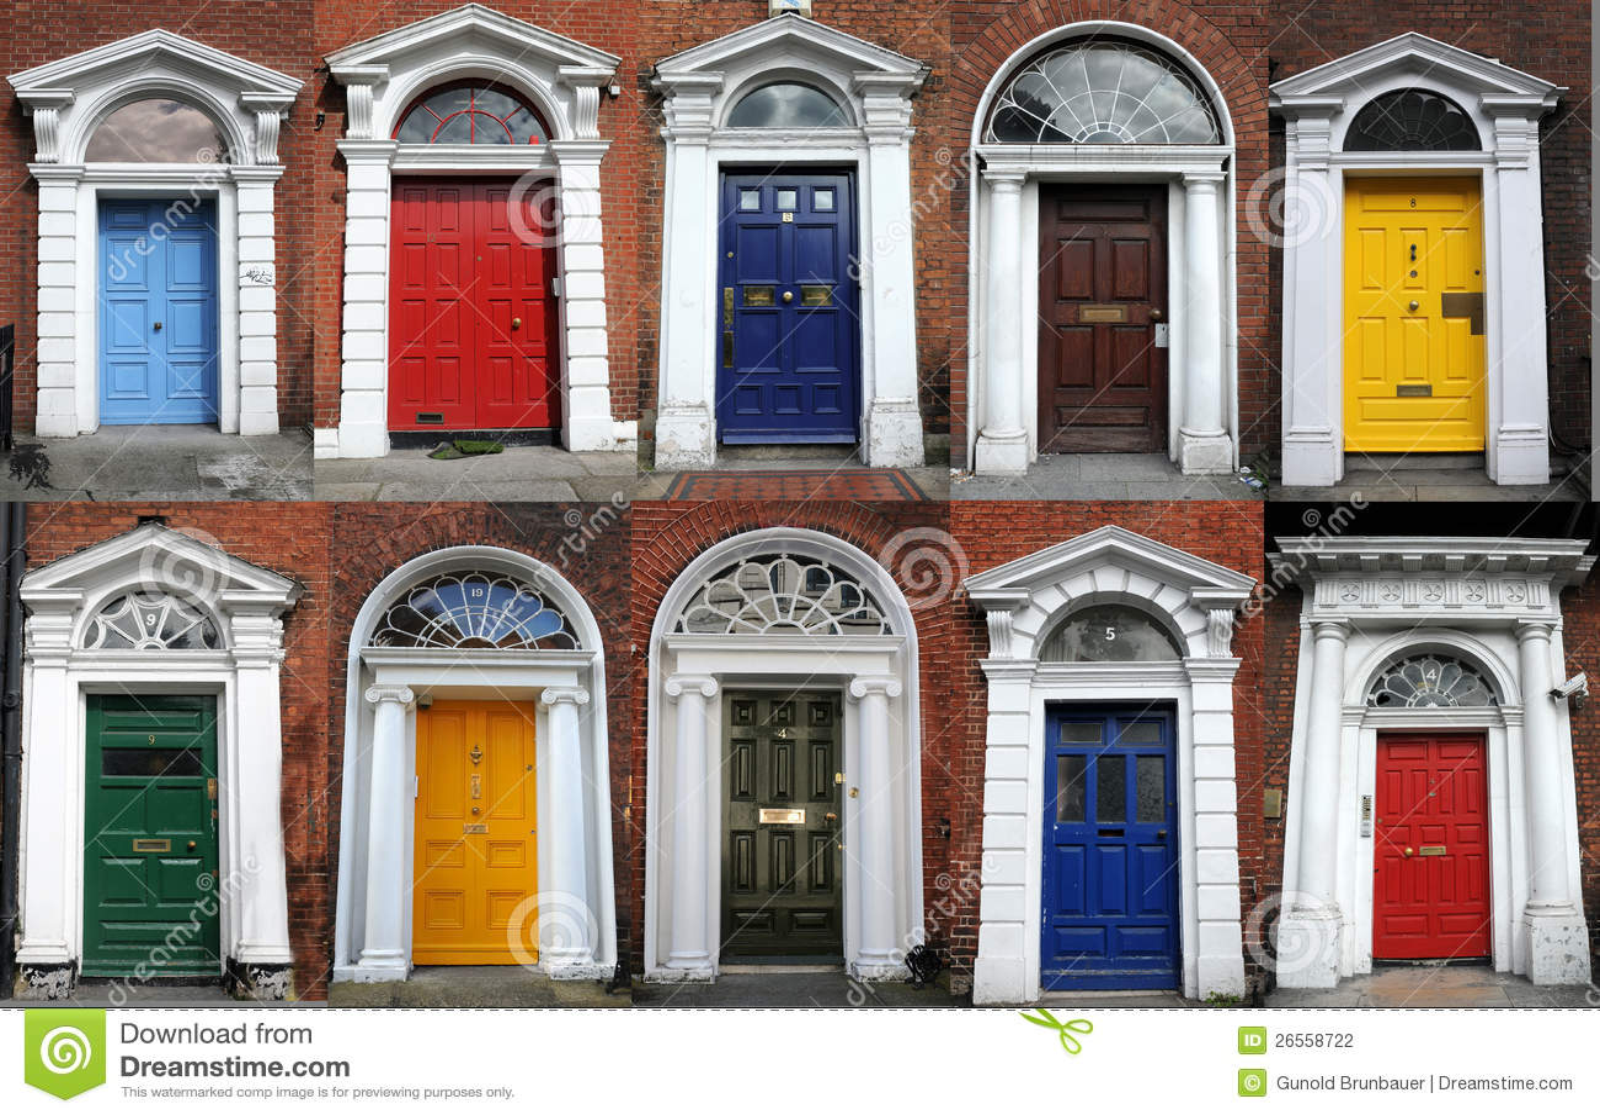 http://thumbs.dreamstime.com/z/dublin-doors-26558722.jpg